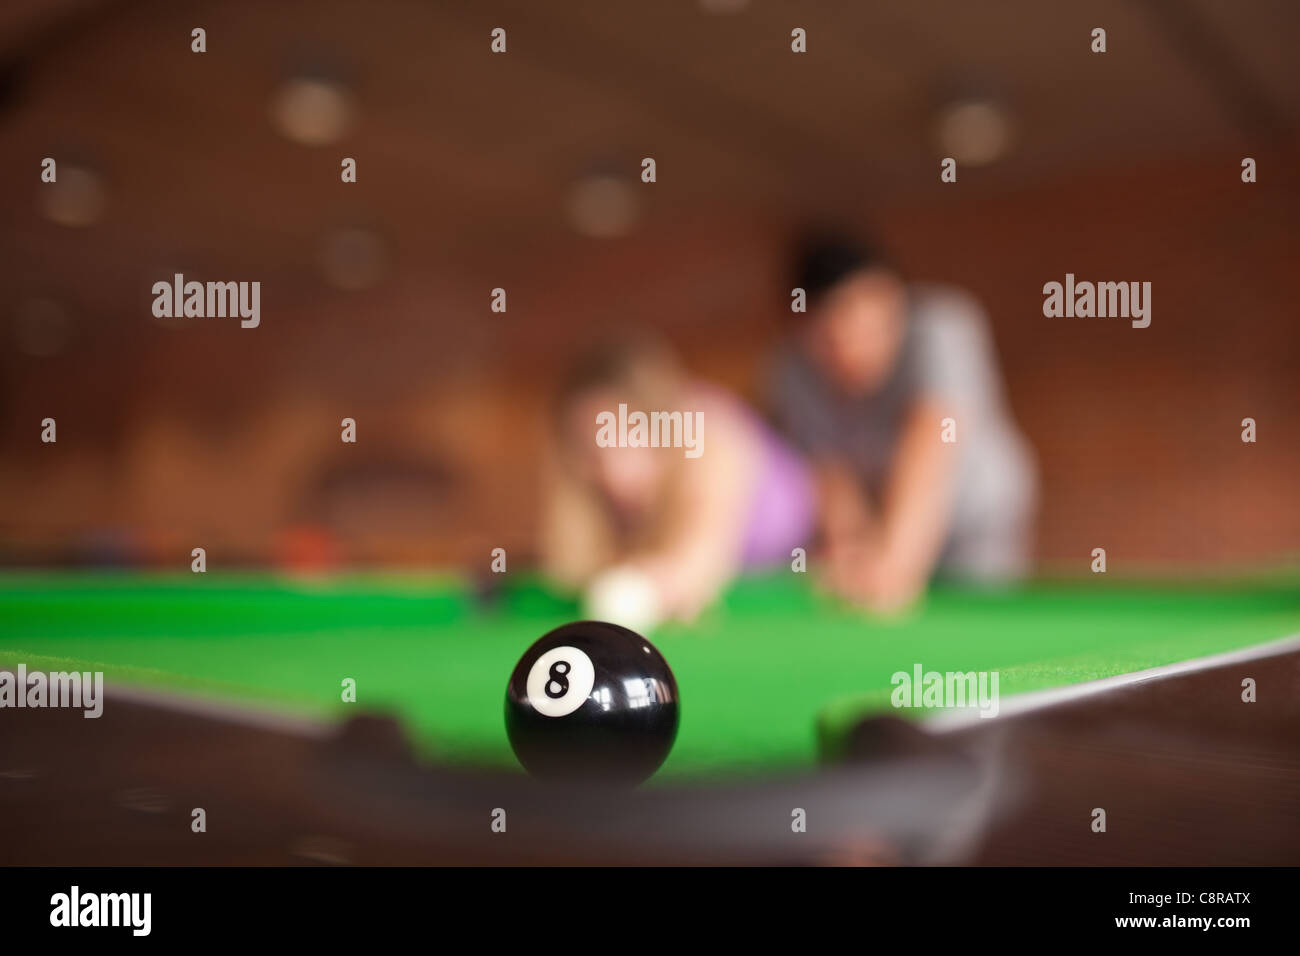 Man teaching pool to his fiance - Stock Image